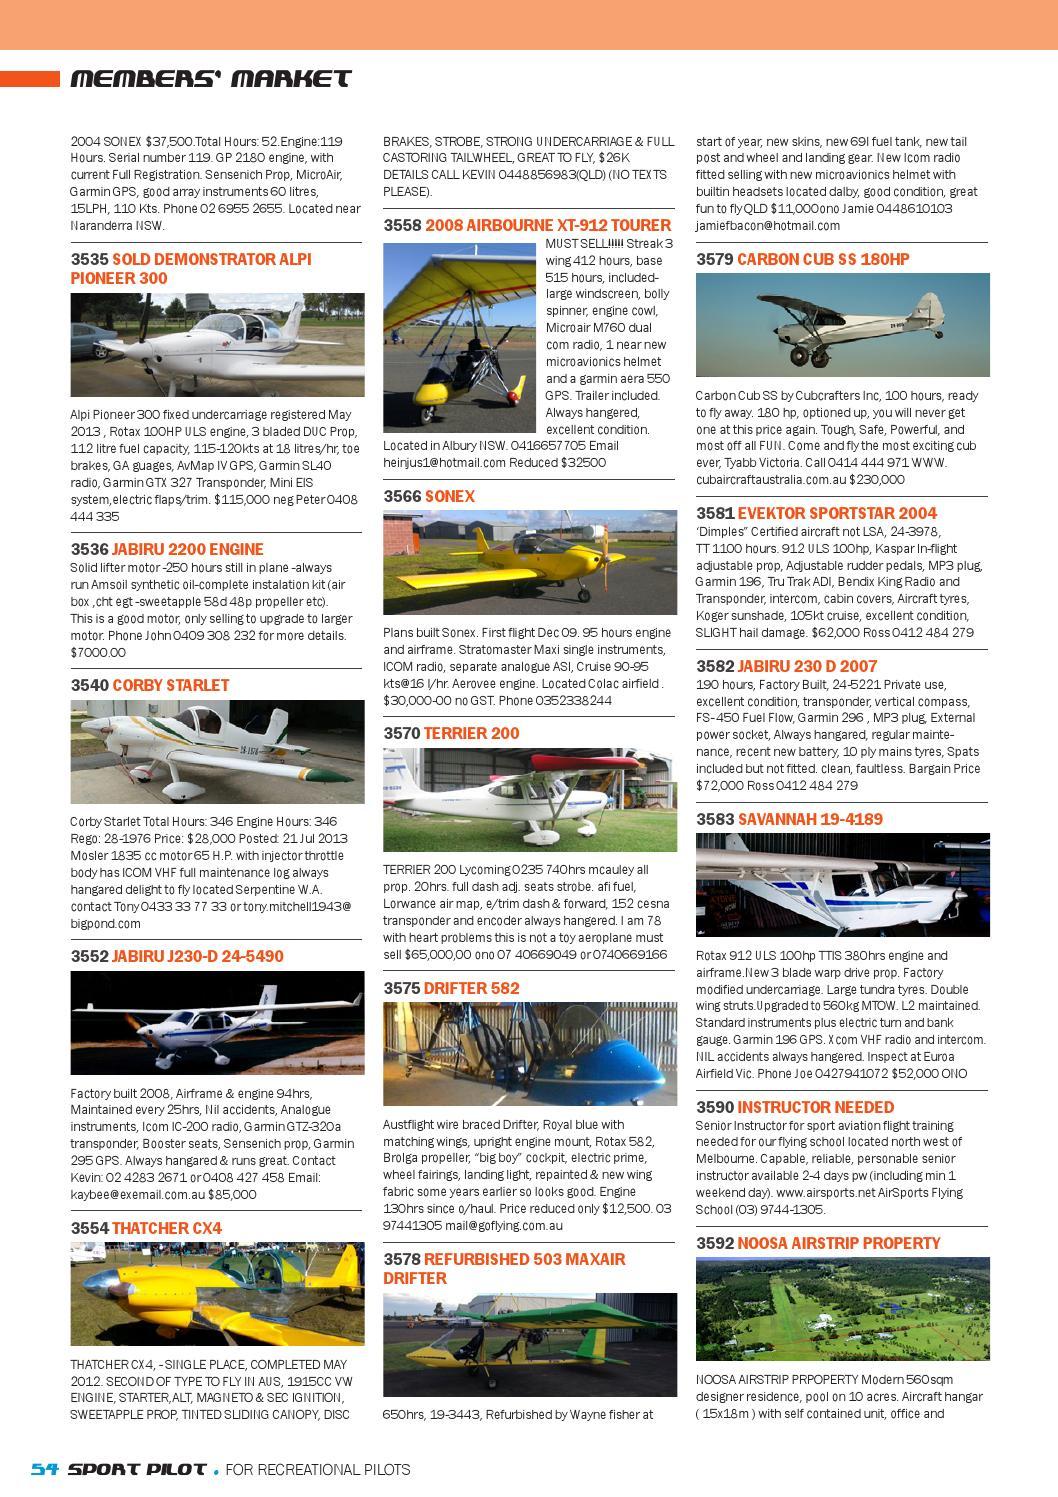 Sport pilot 31 feb 2014 by Recreational Aviation Australia